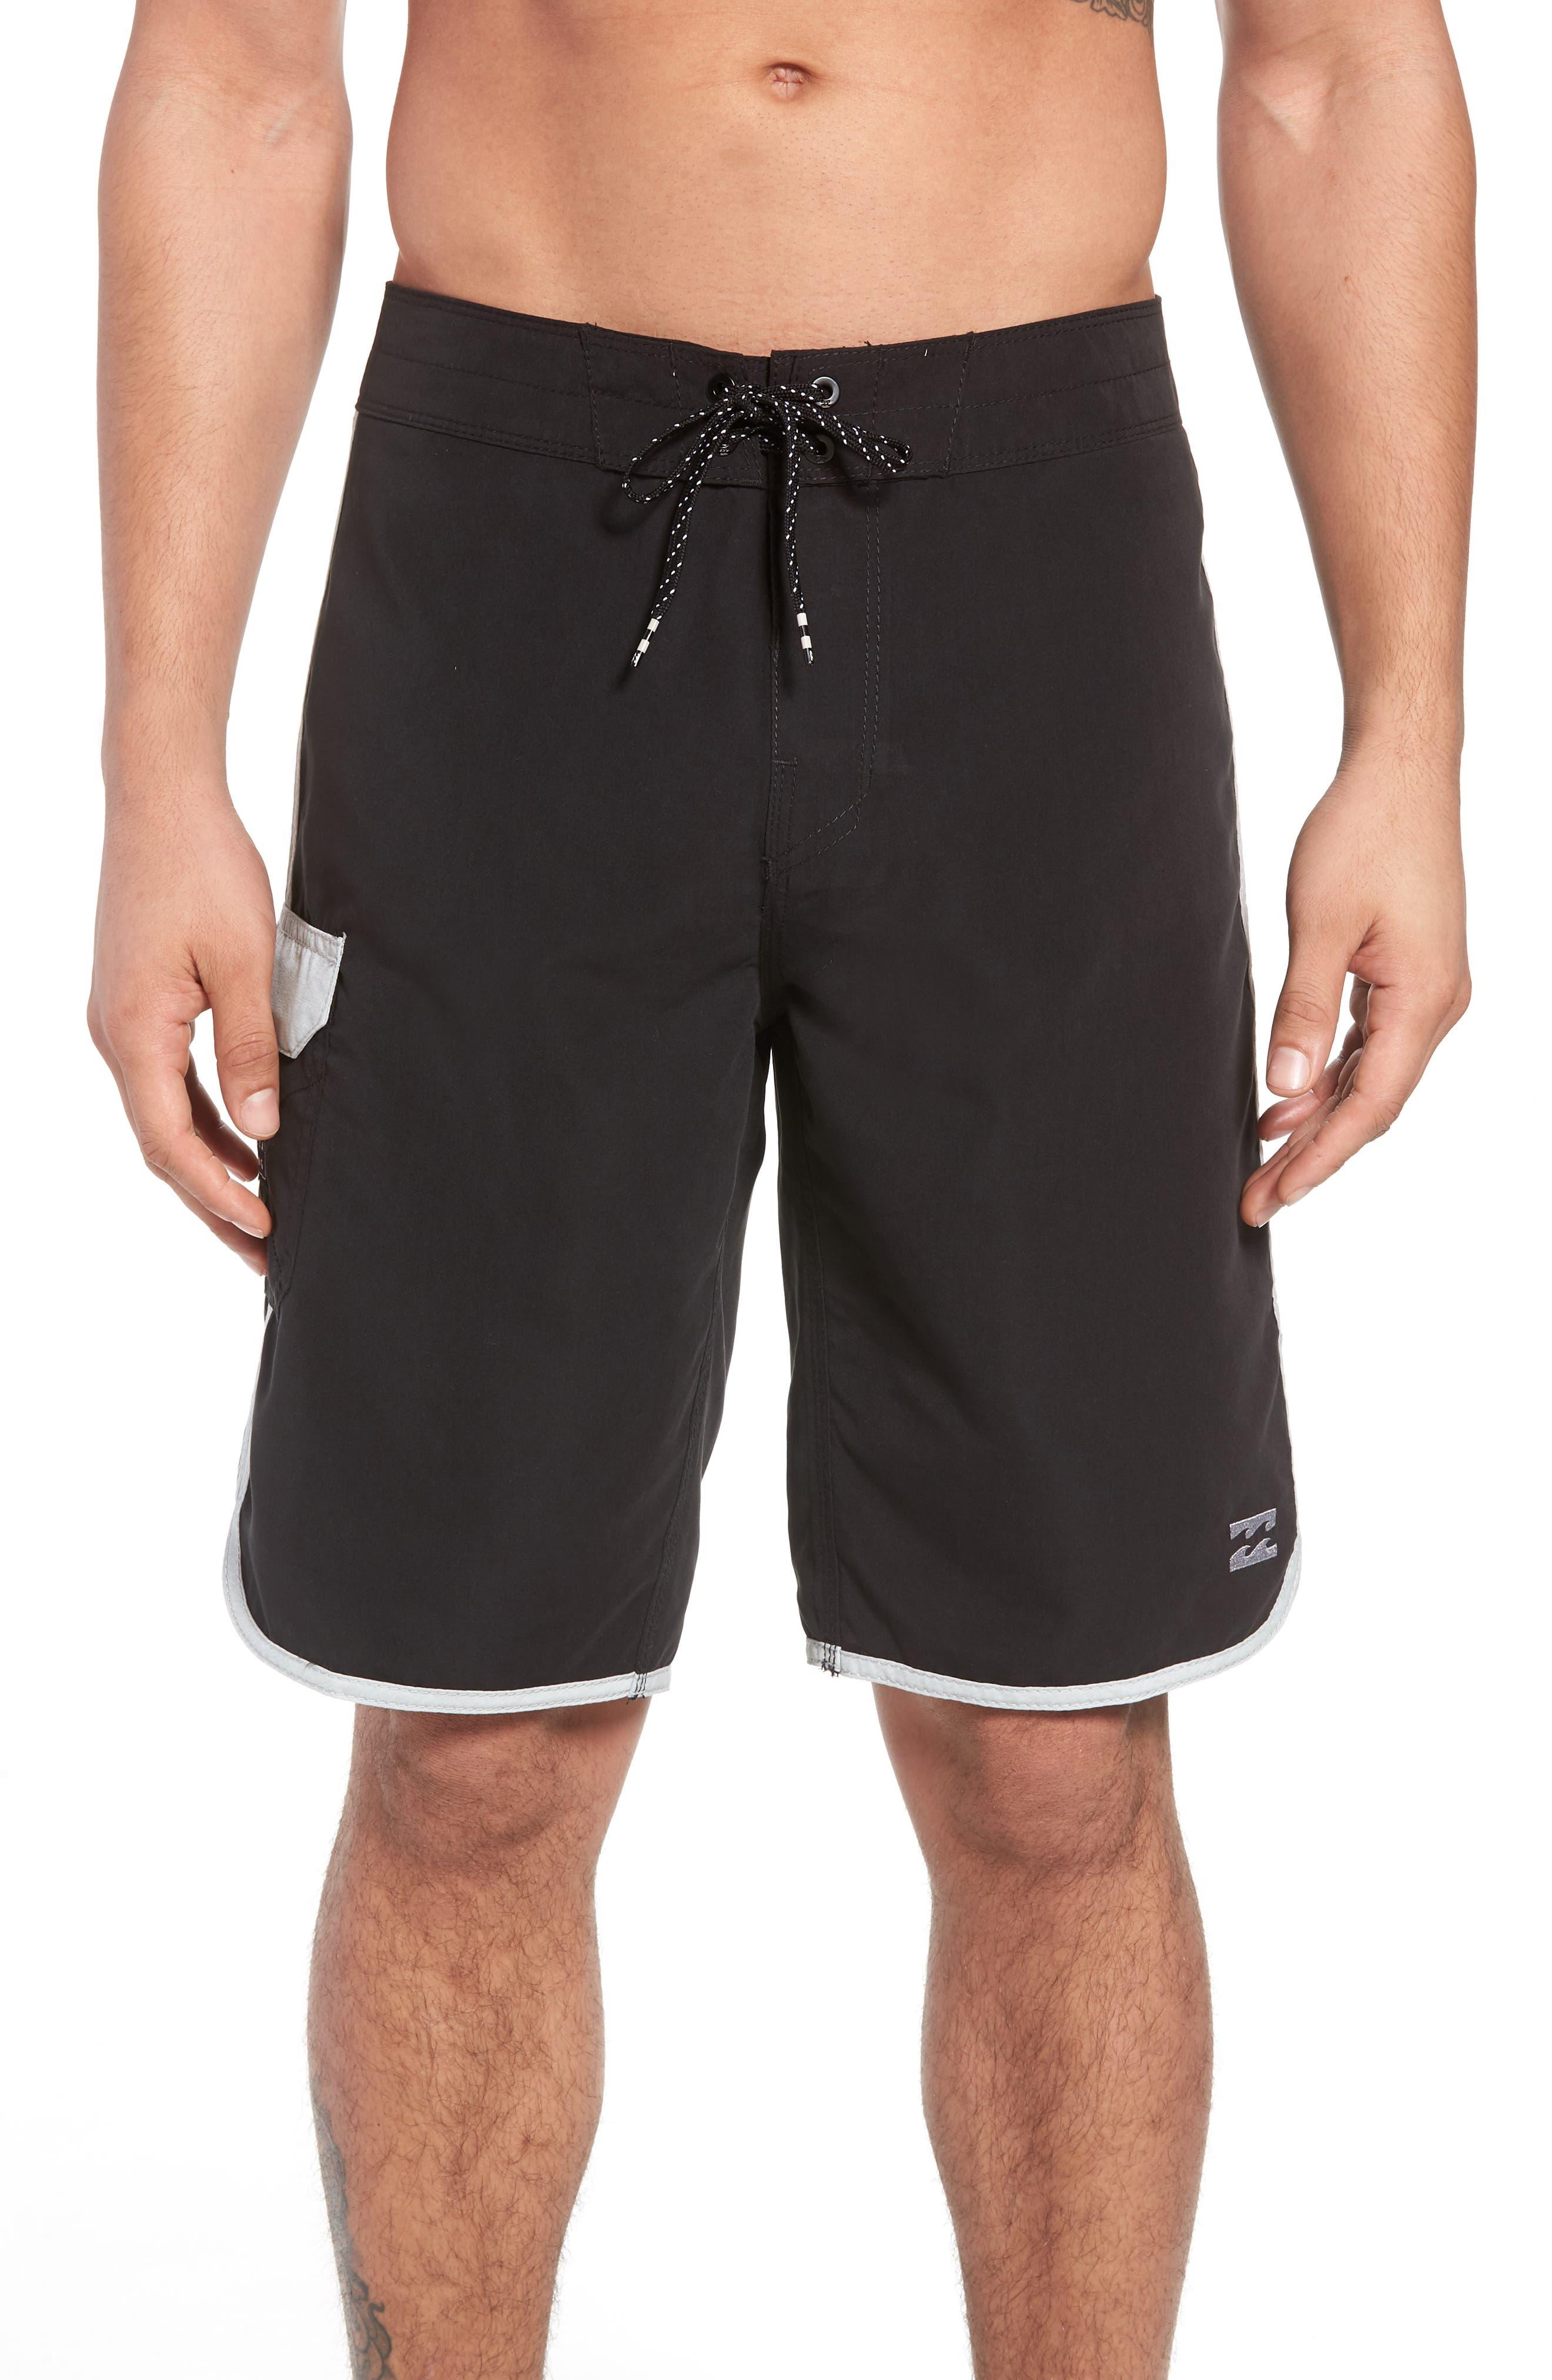 73 OG Board Shorts,                             Main thumbnail 1, color,                             Black